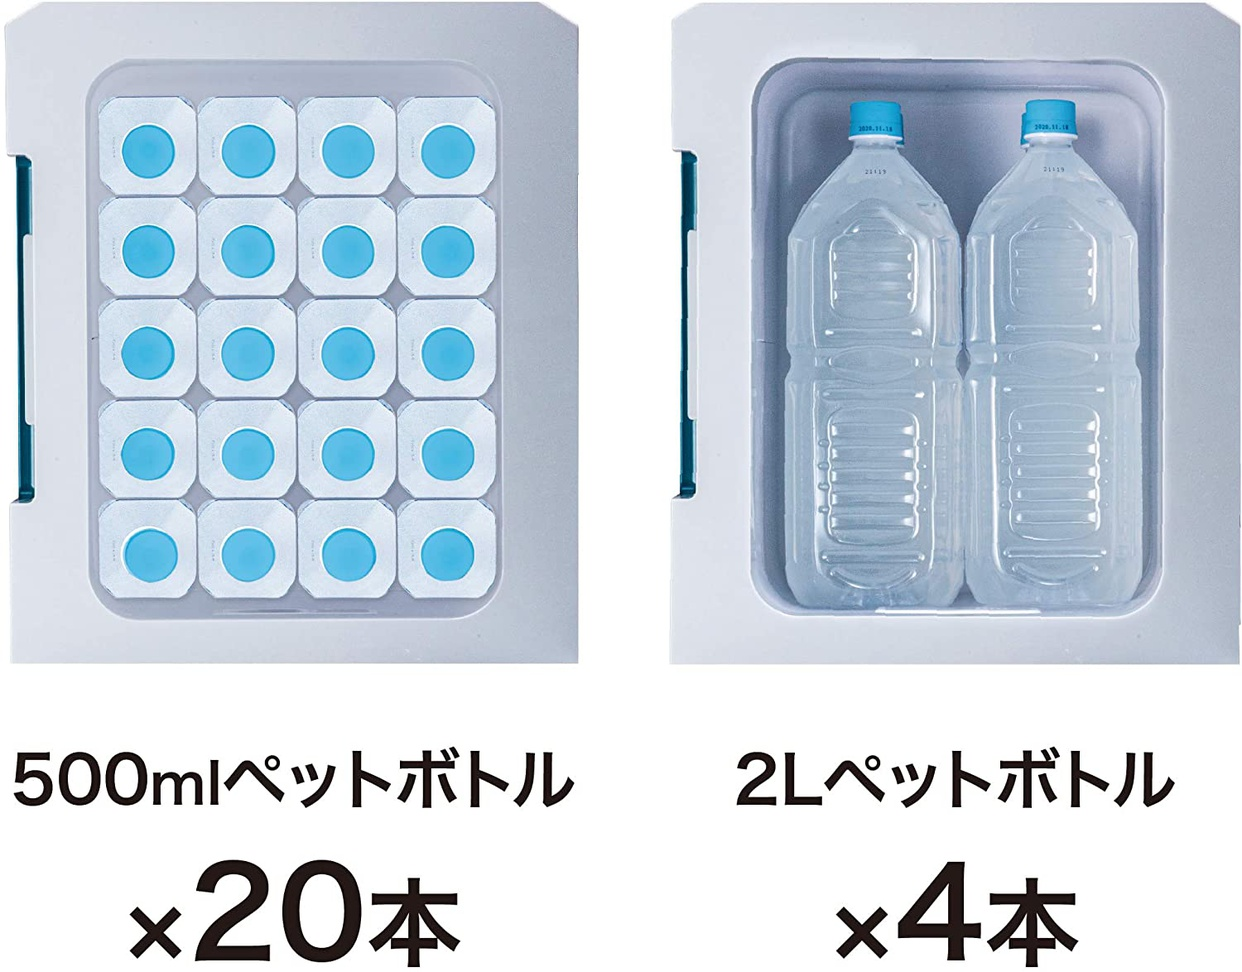 makita(マキタ) 充電式保冷温庫 CW180DZの商品画像6